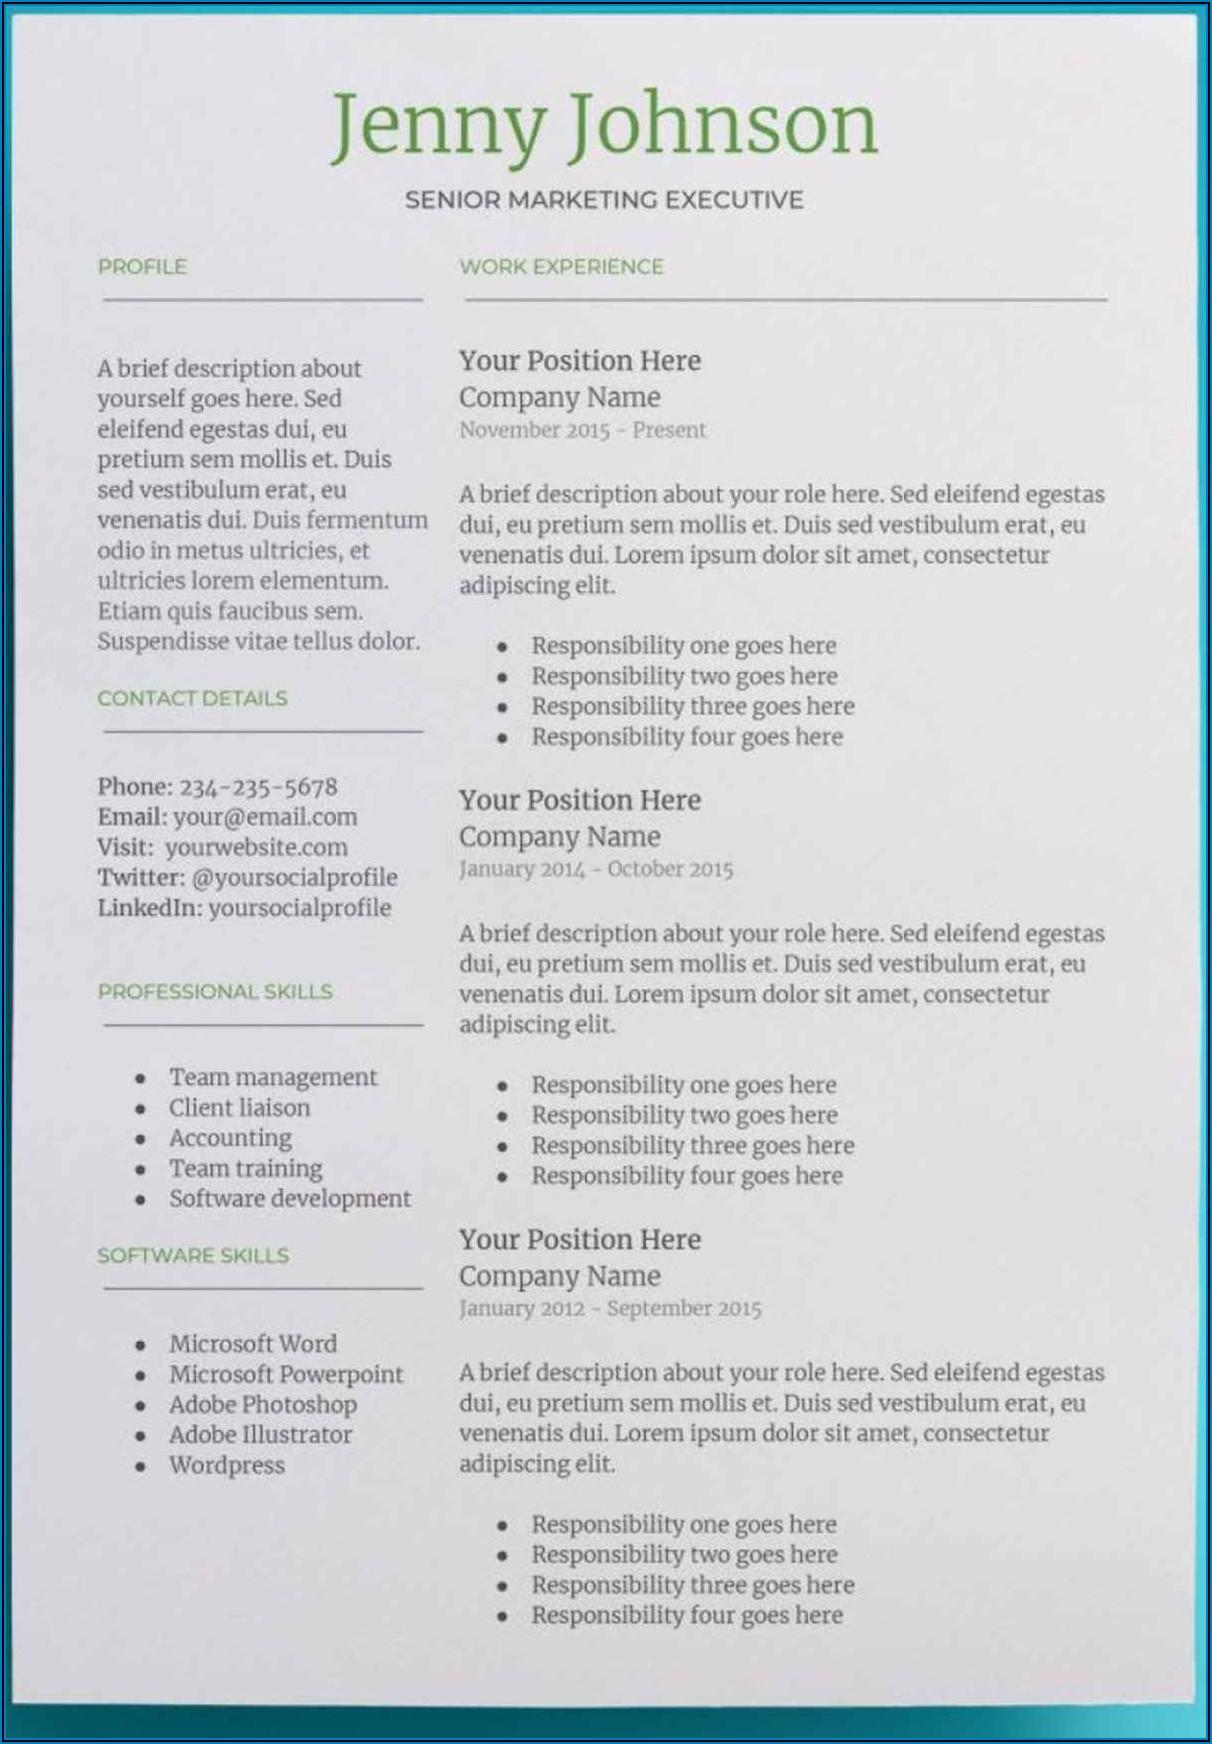 Resume Templates Google Docs Free Download